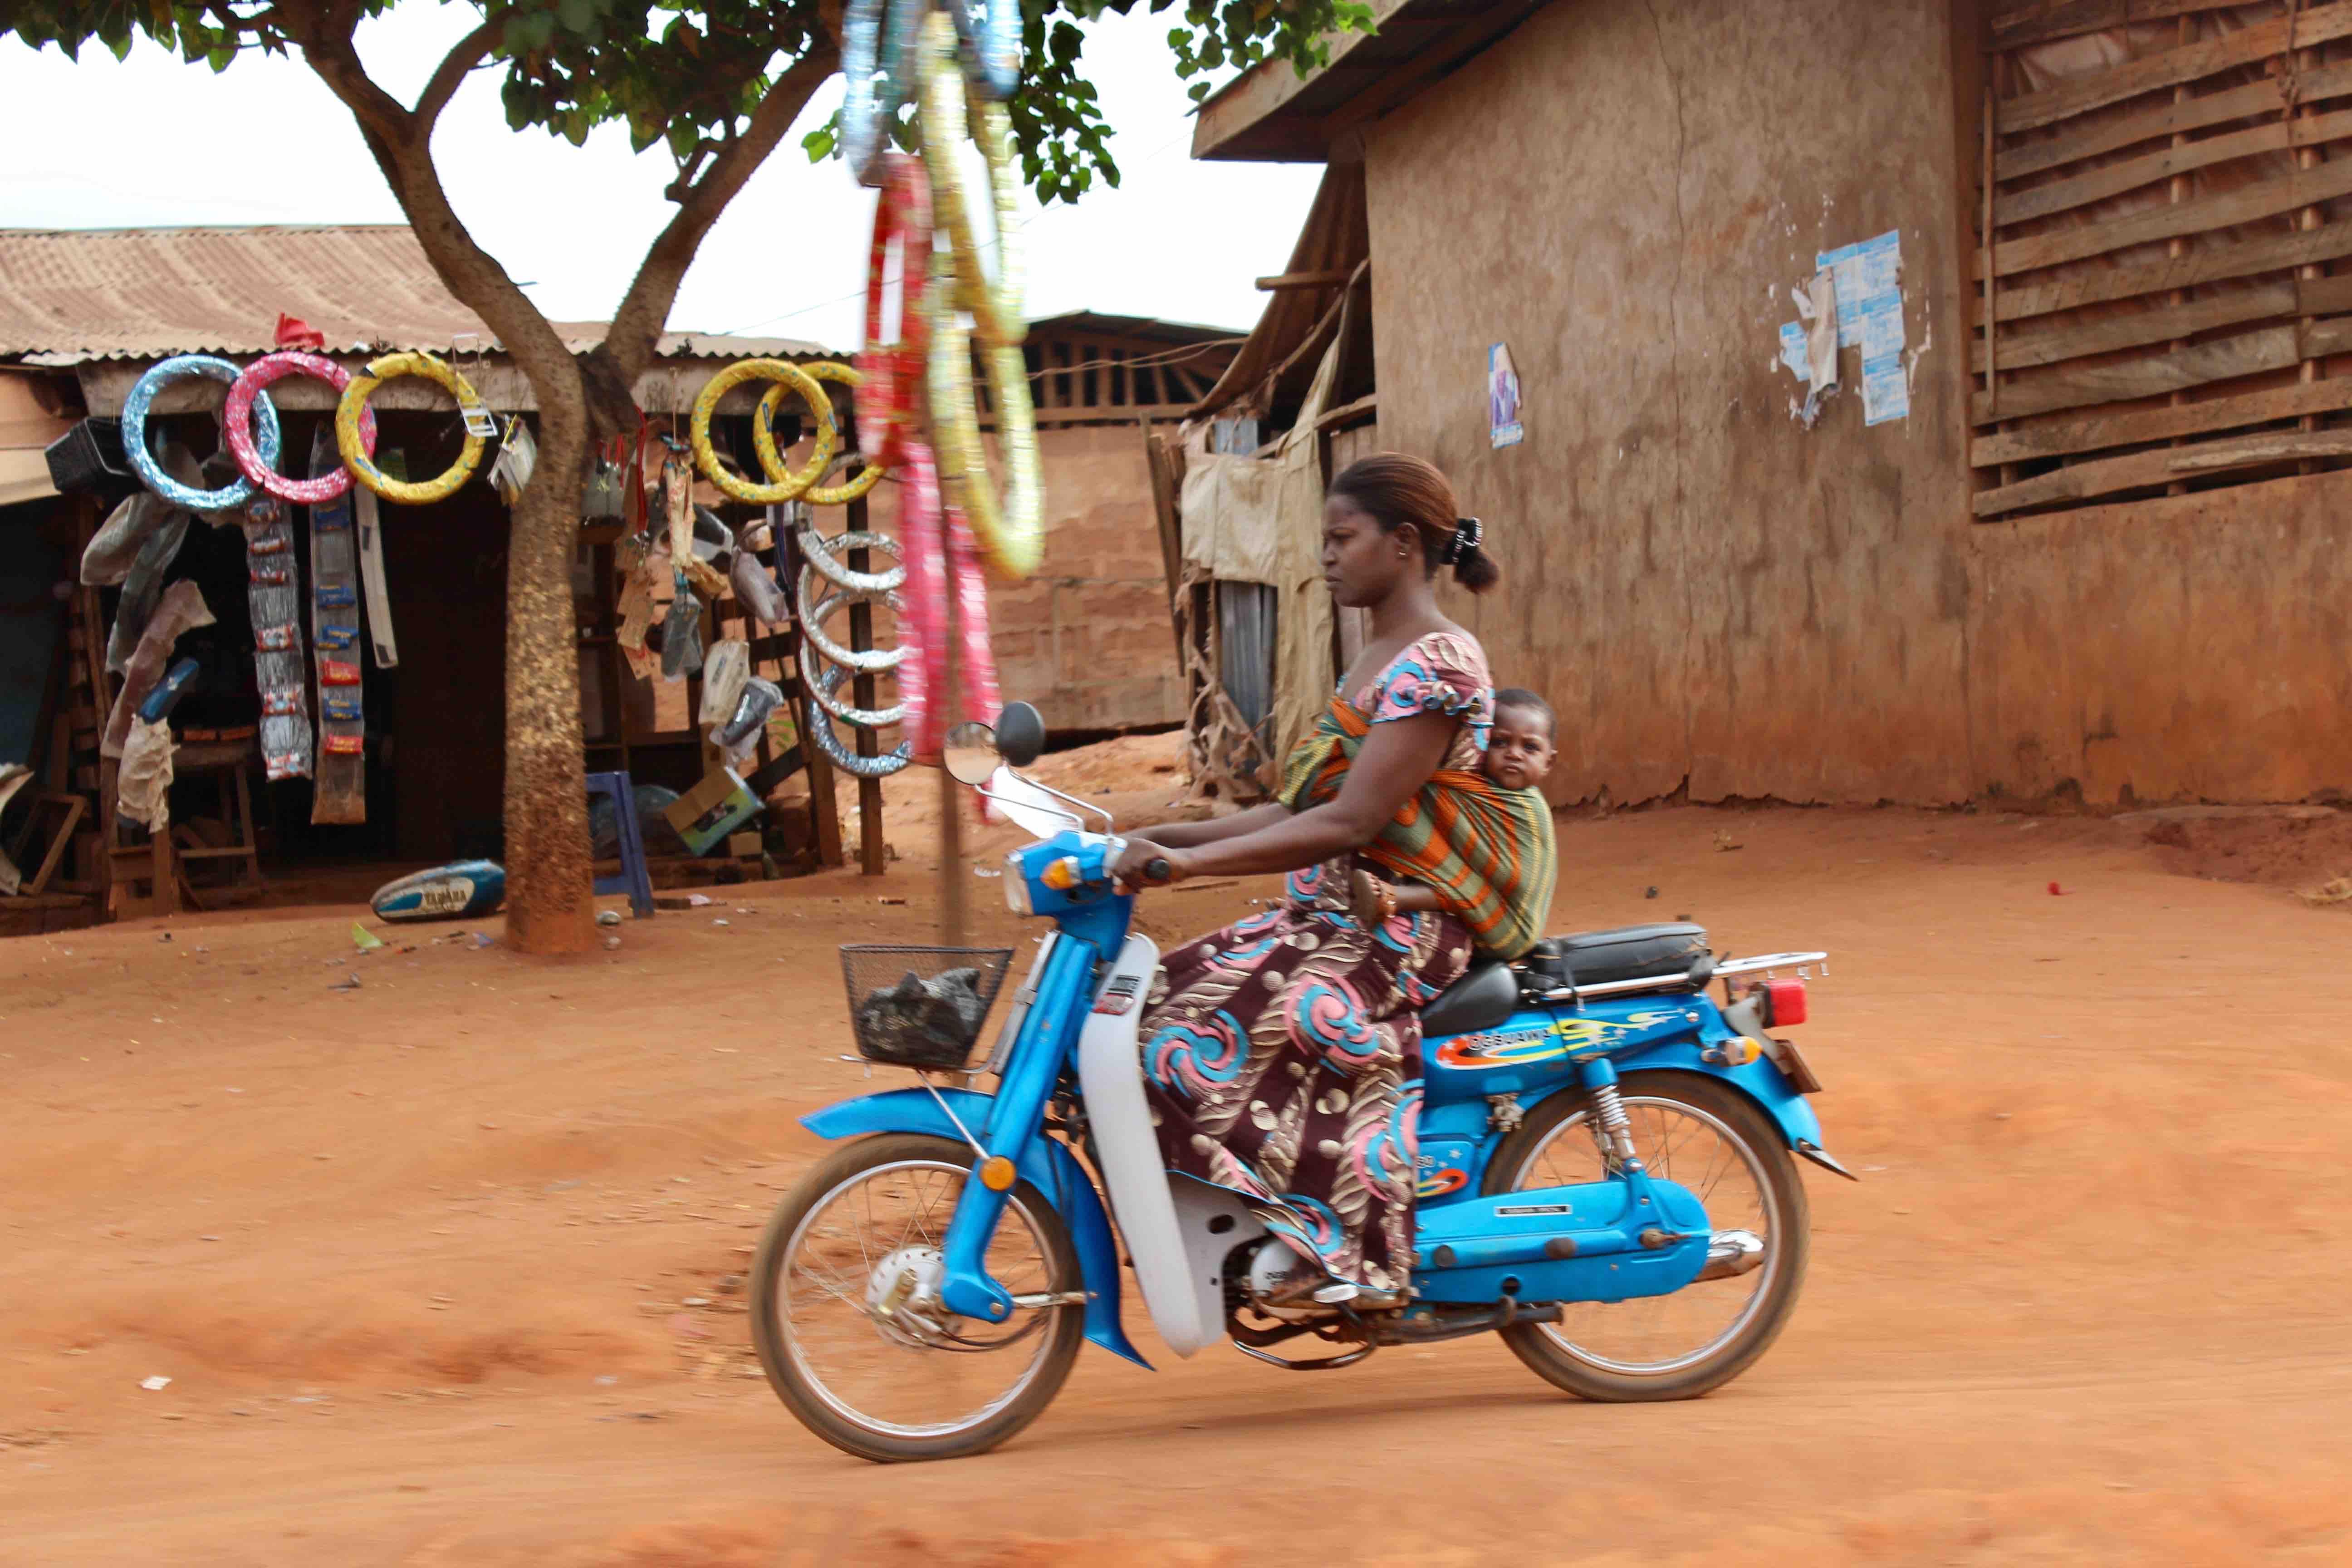 Igbo mother and child motorcycling, Iheaka Village, Enugu State, Nigeria. #JujuFilms